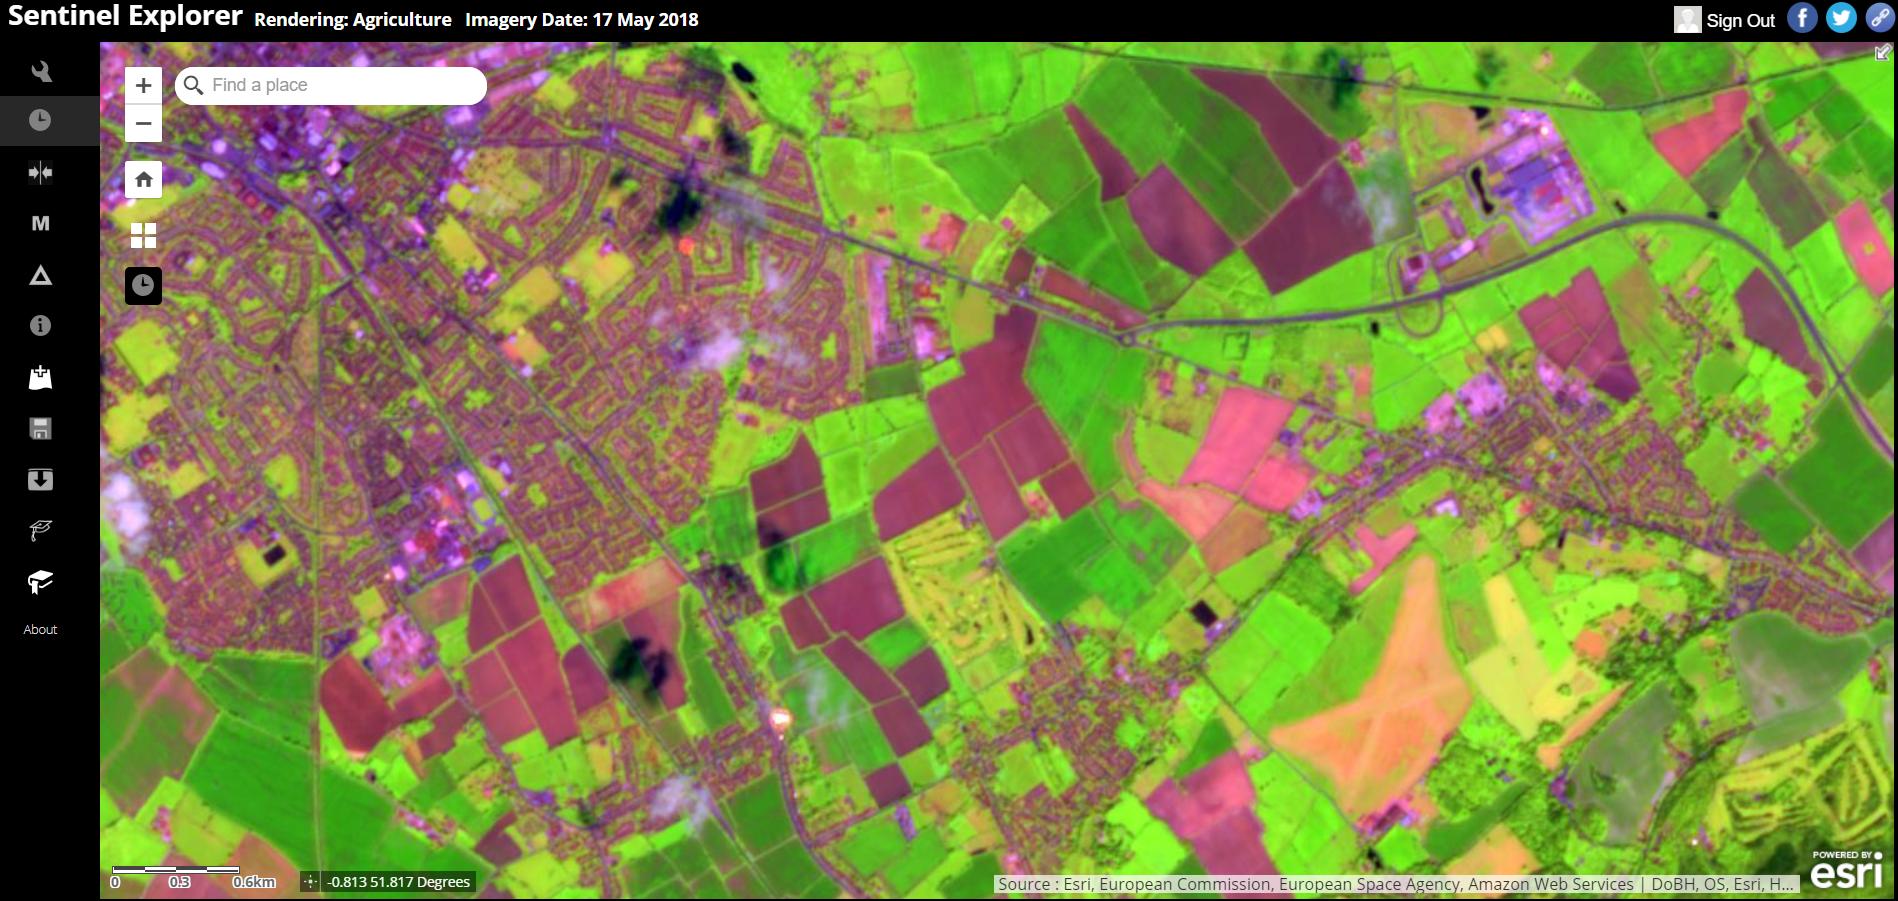 sentinel-2 explorer app. rendering agricultural imagery,